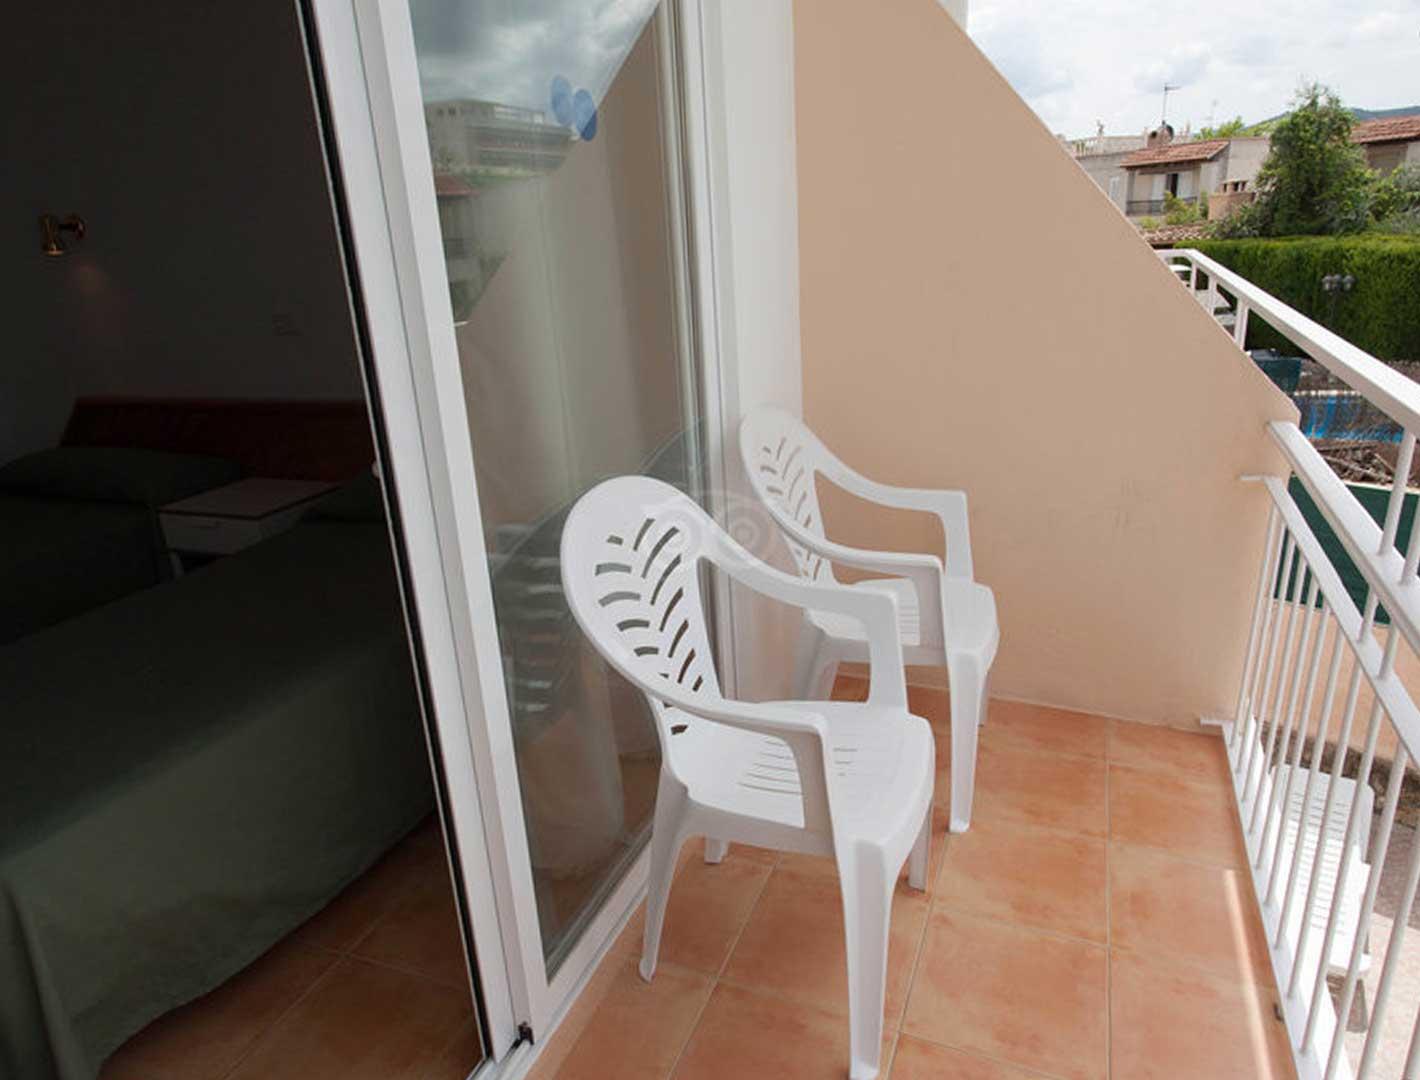 https://www.apartamentosbonsol-ibiza.com/wp-content/uploads/2020/02/superior-double-4.jpg